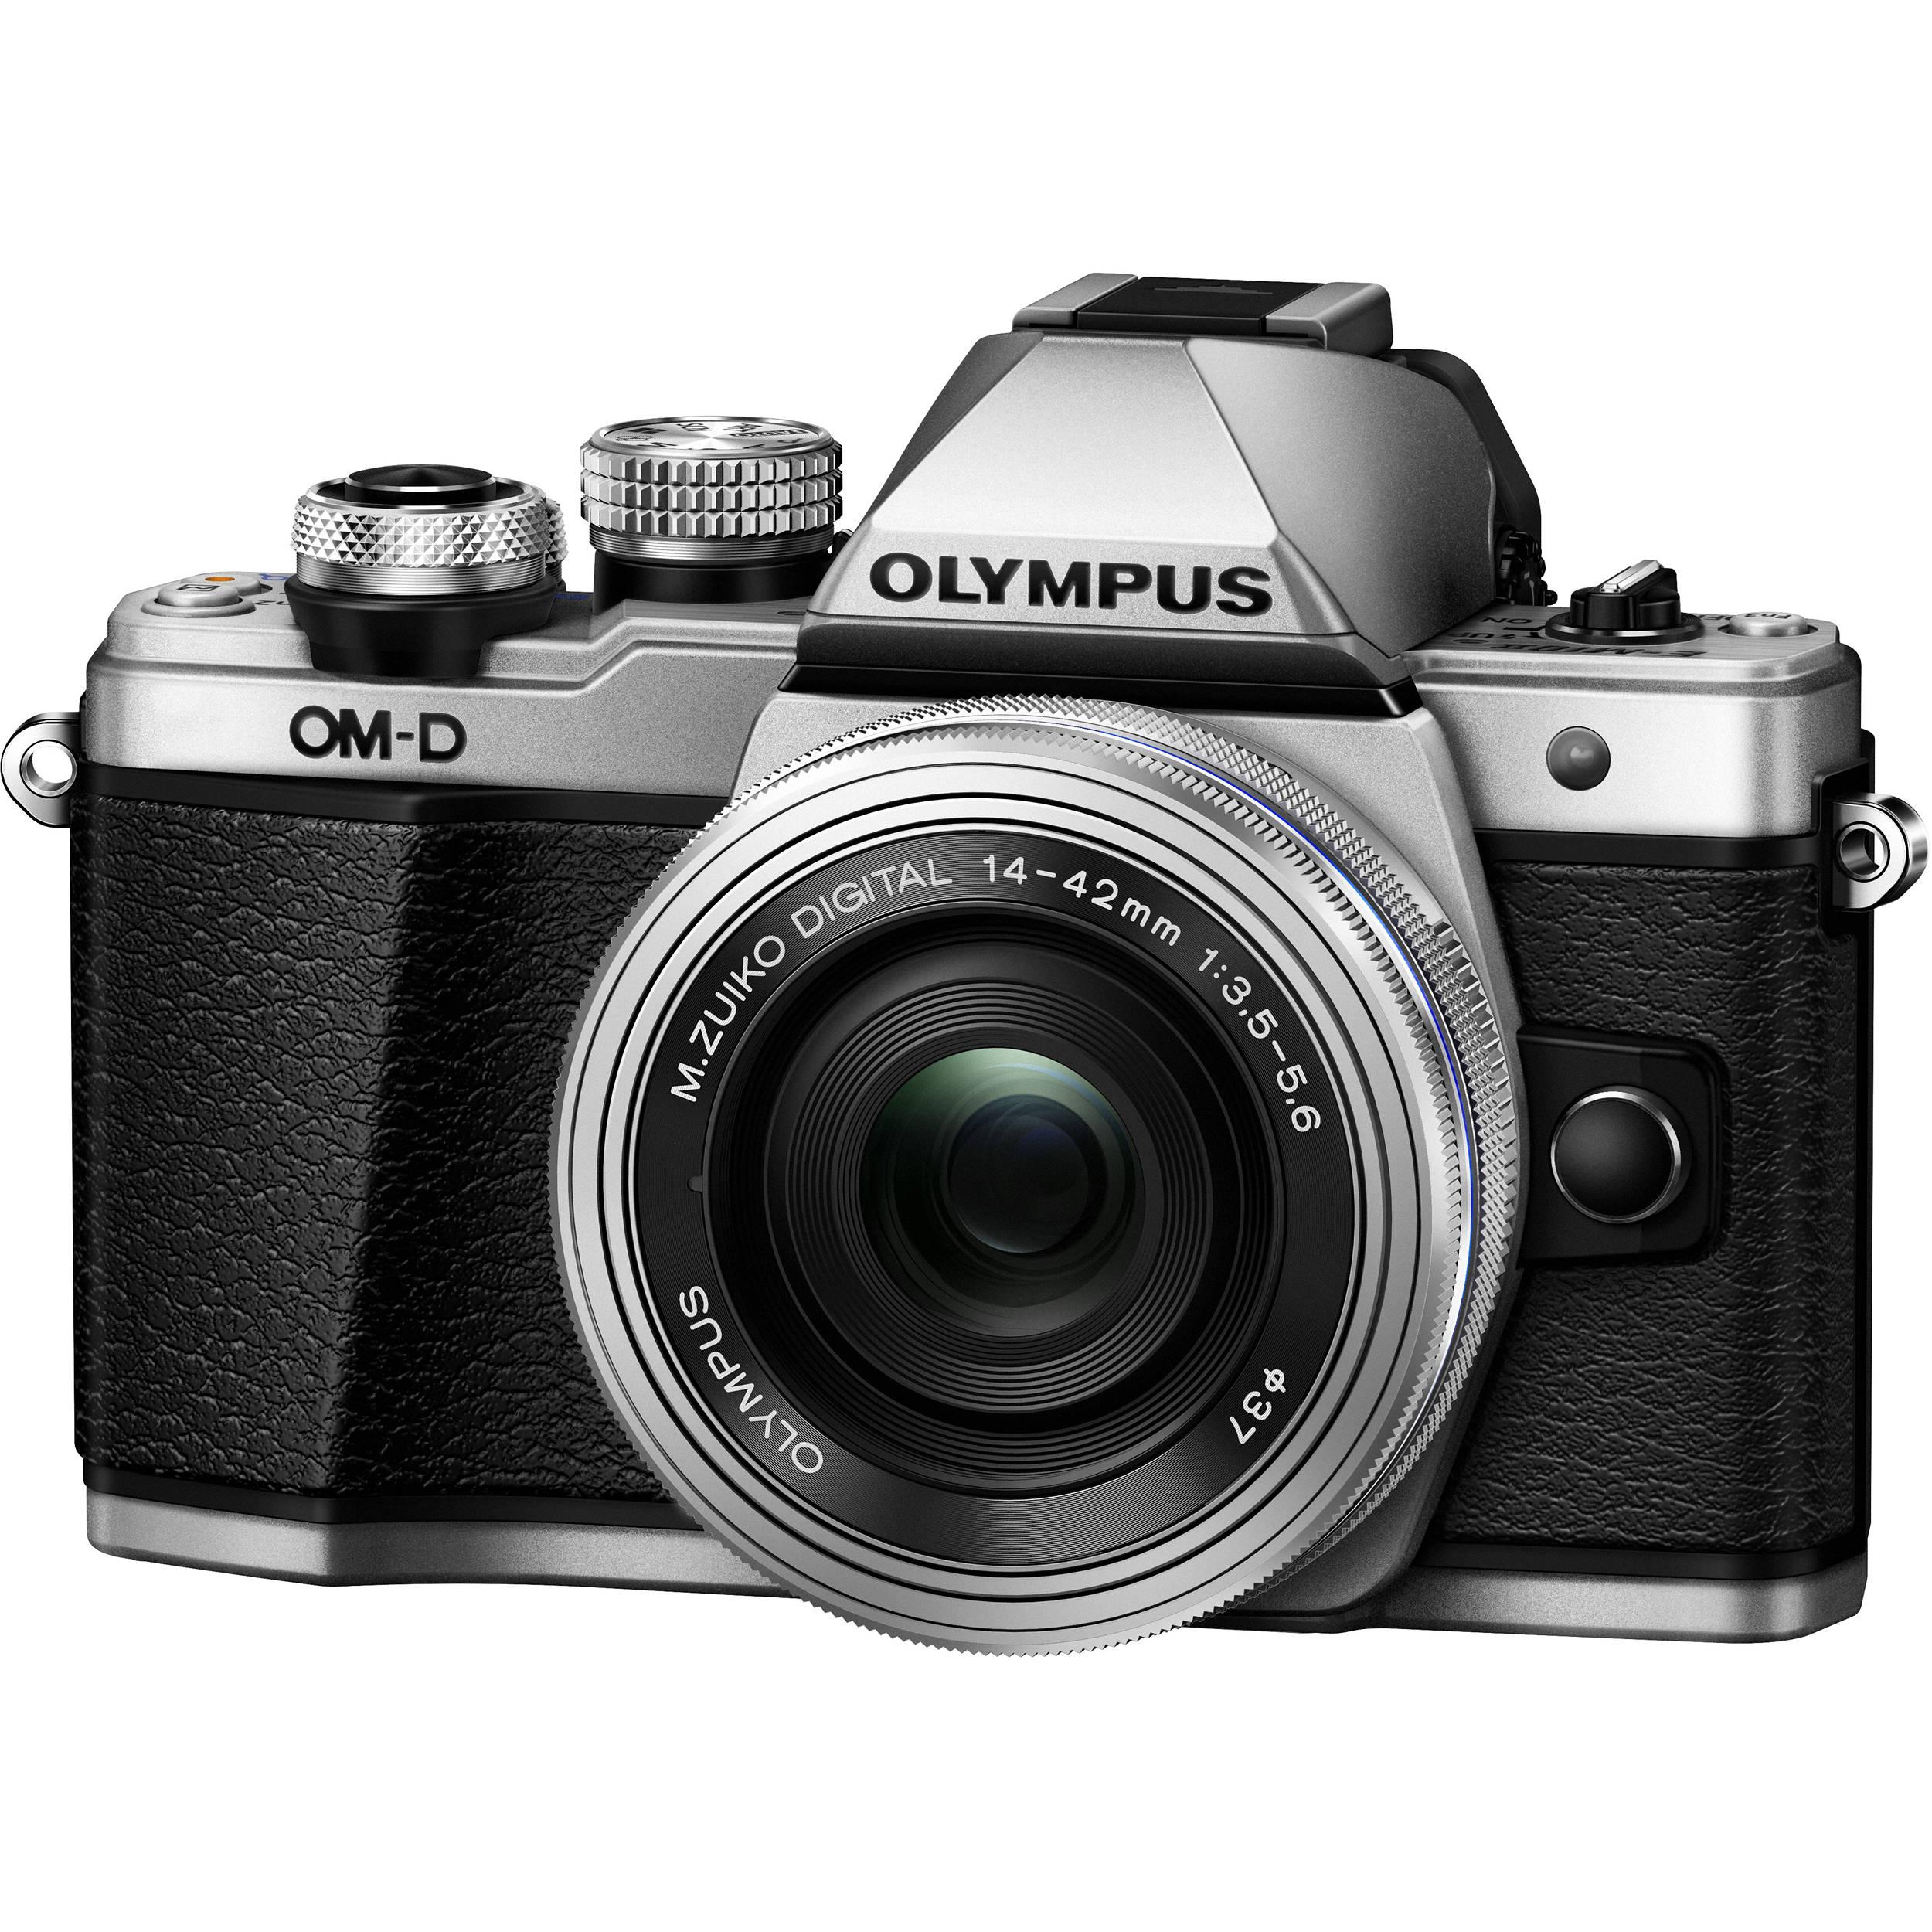 olympus_v207052su000_om_d_e_m10_mark_ii_1179113